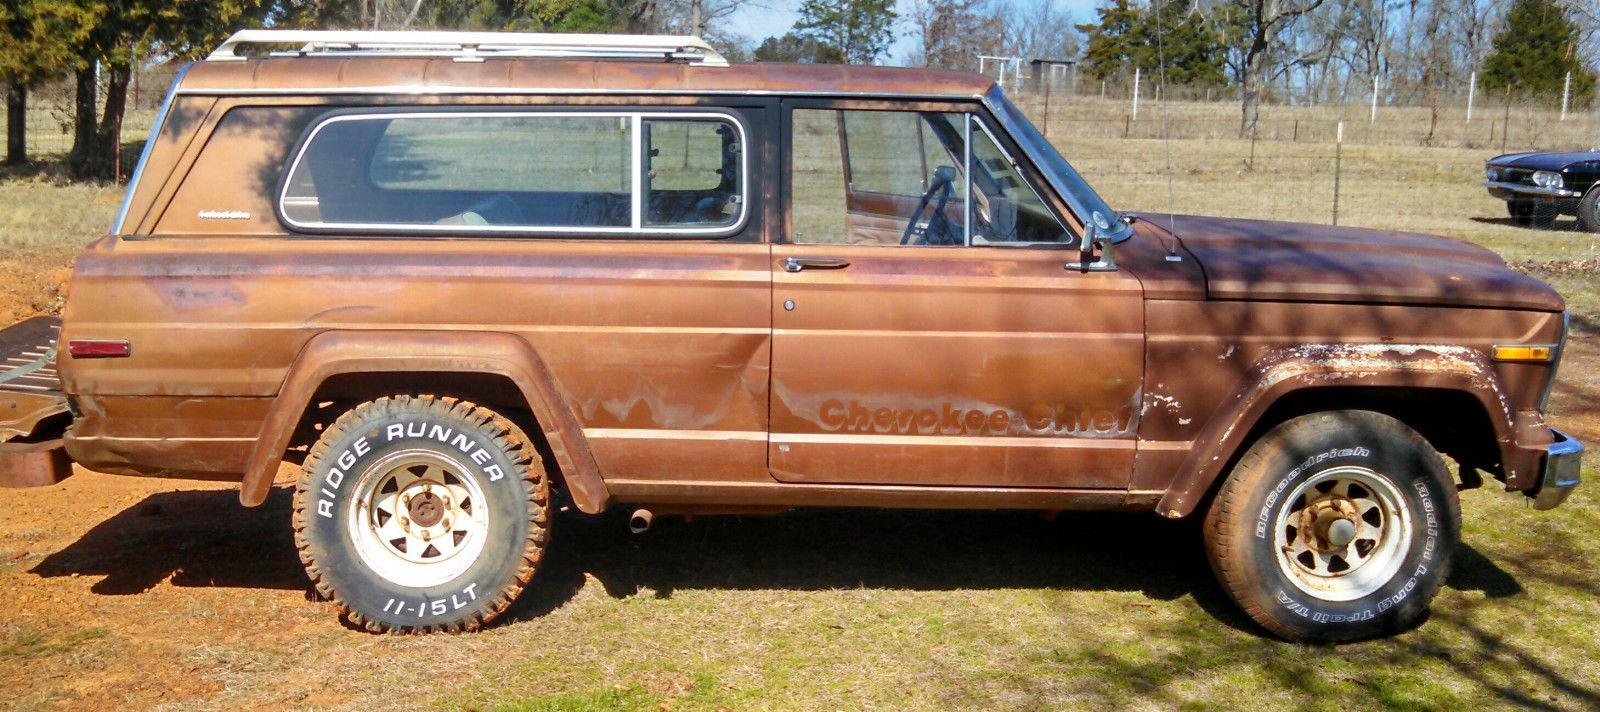 1979 jeep cherokee chief s 2 door classic jeep cherokee 1979 for sale. Black Bedroom Furniture Sets. Home Design Ideas